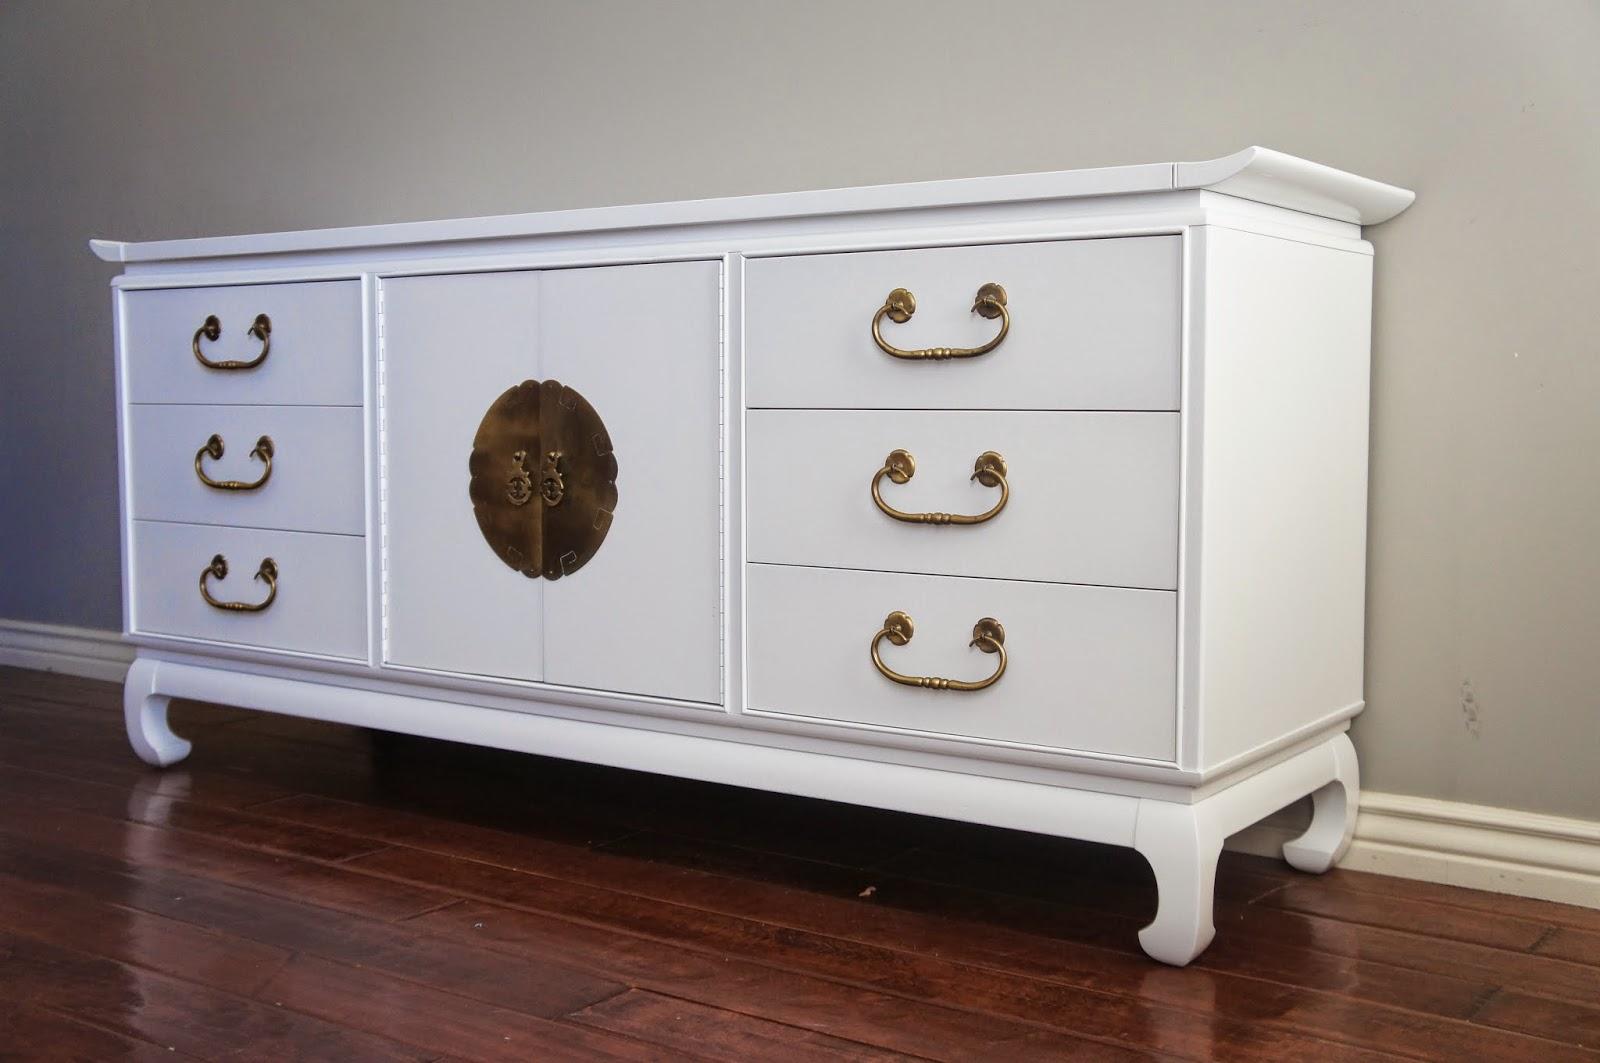 Beau Regency Modern High Gloss White Lacquered Dresser